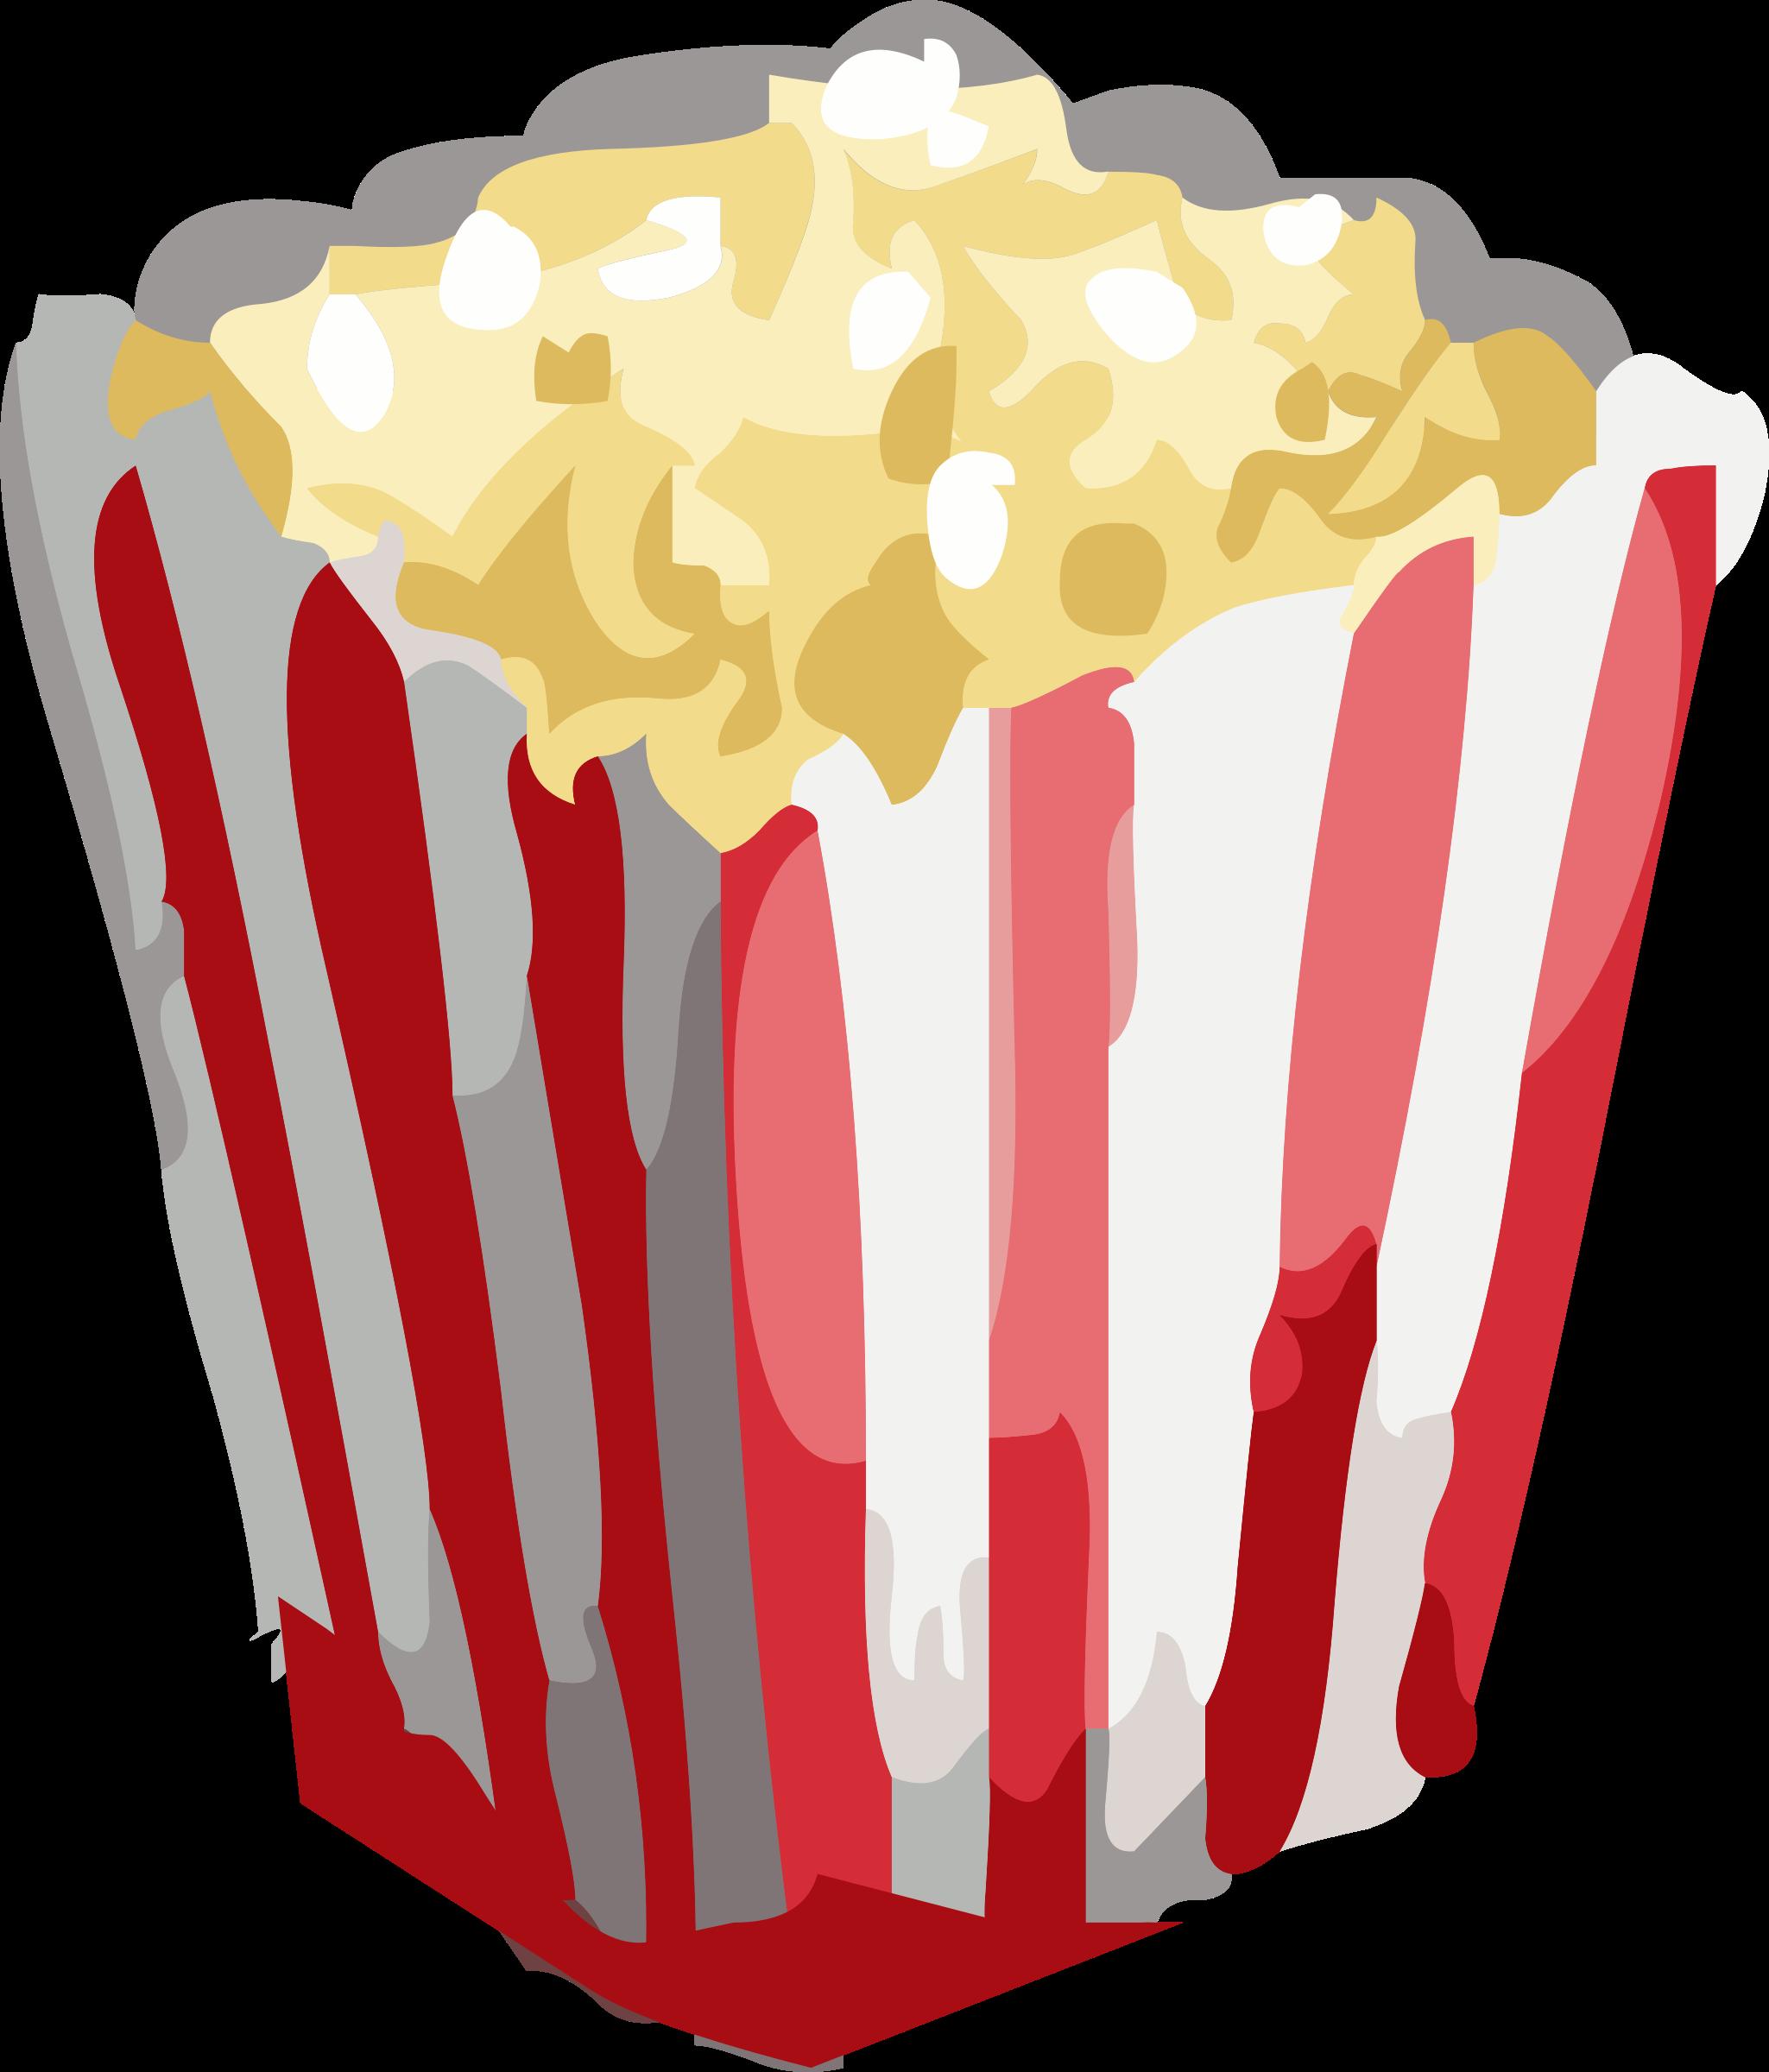 popcorn kernel clipart at getdrawings com free for personal use rh getdrawings com free clipart popcorn kernel free clip art popcorn